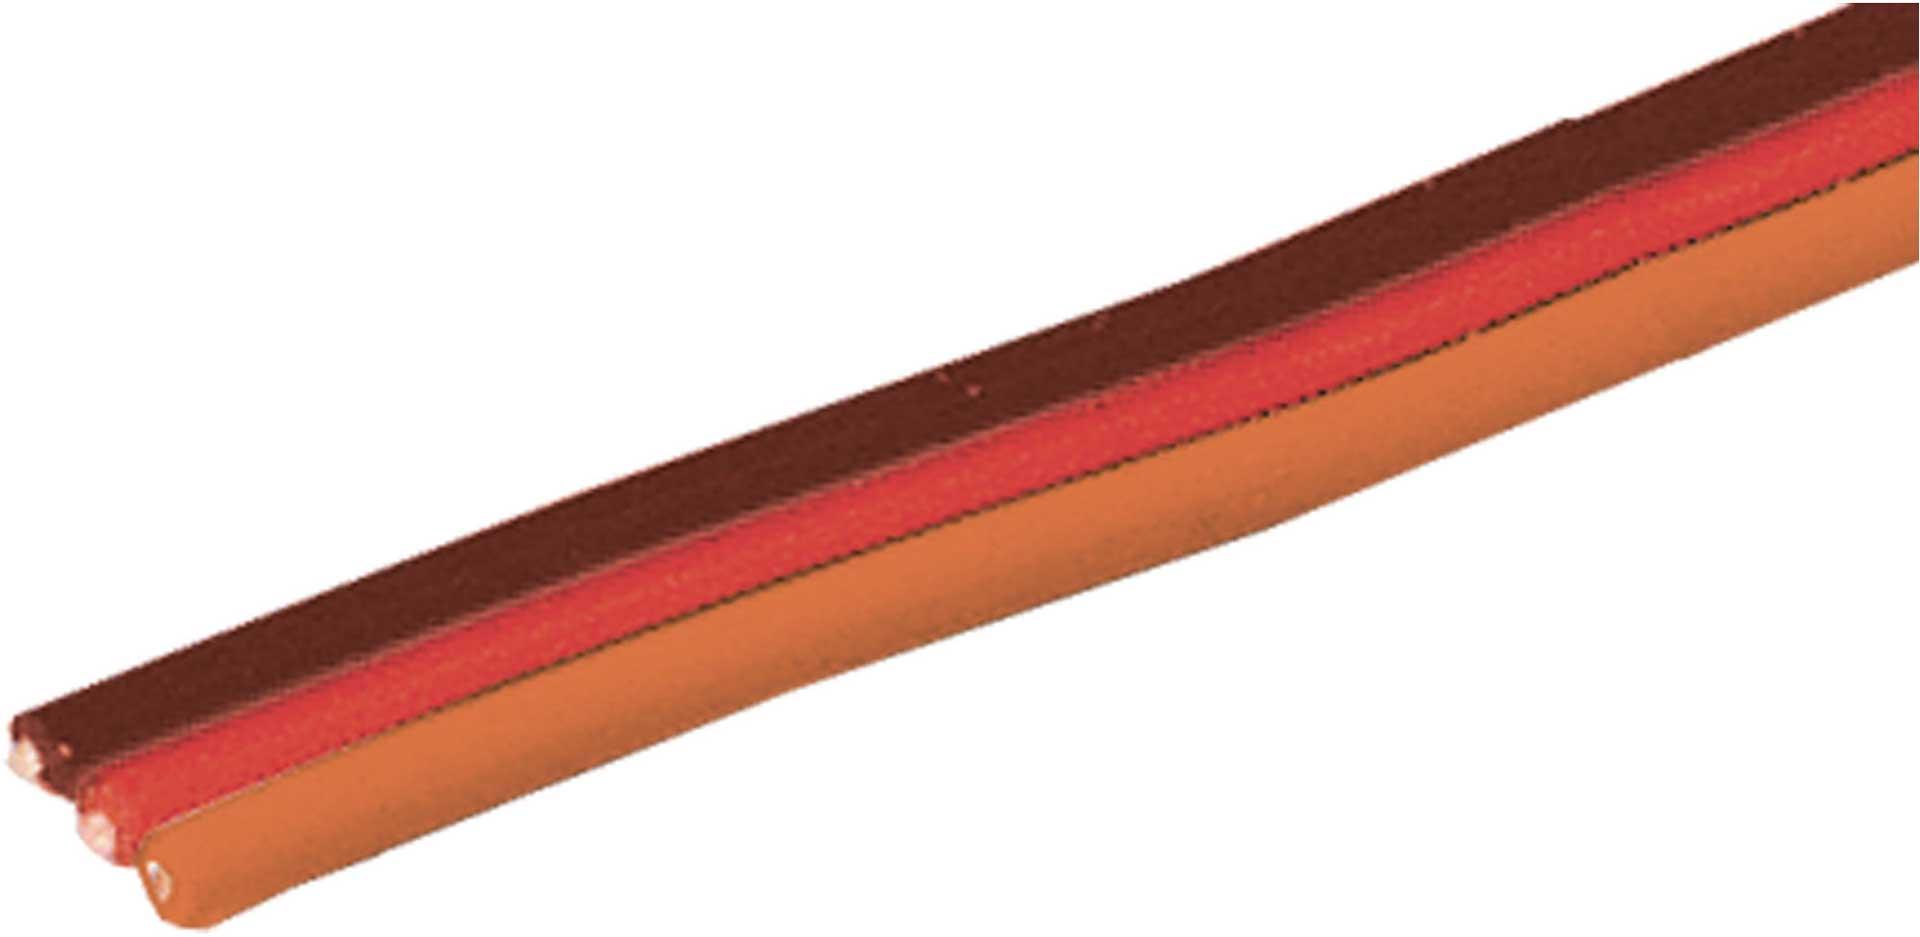 Robbe Modellsport Servokabel Graupner/JR/Uni 10 Meter flach 0,13mm² (26AWG) PVC Meterware